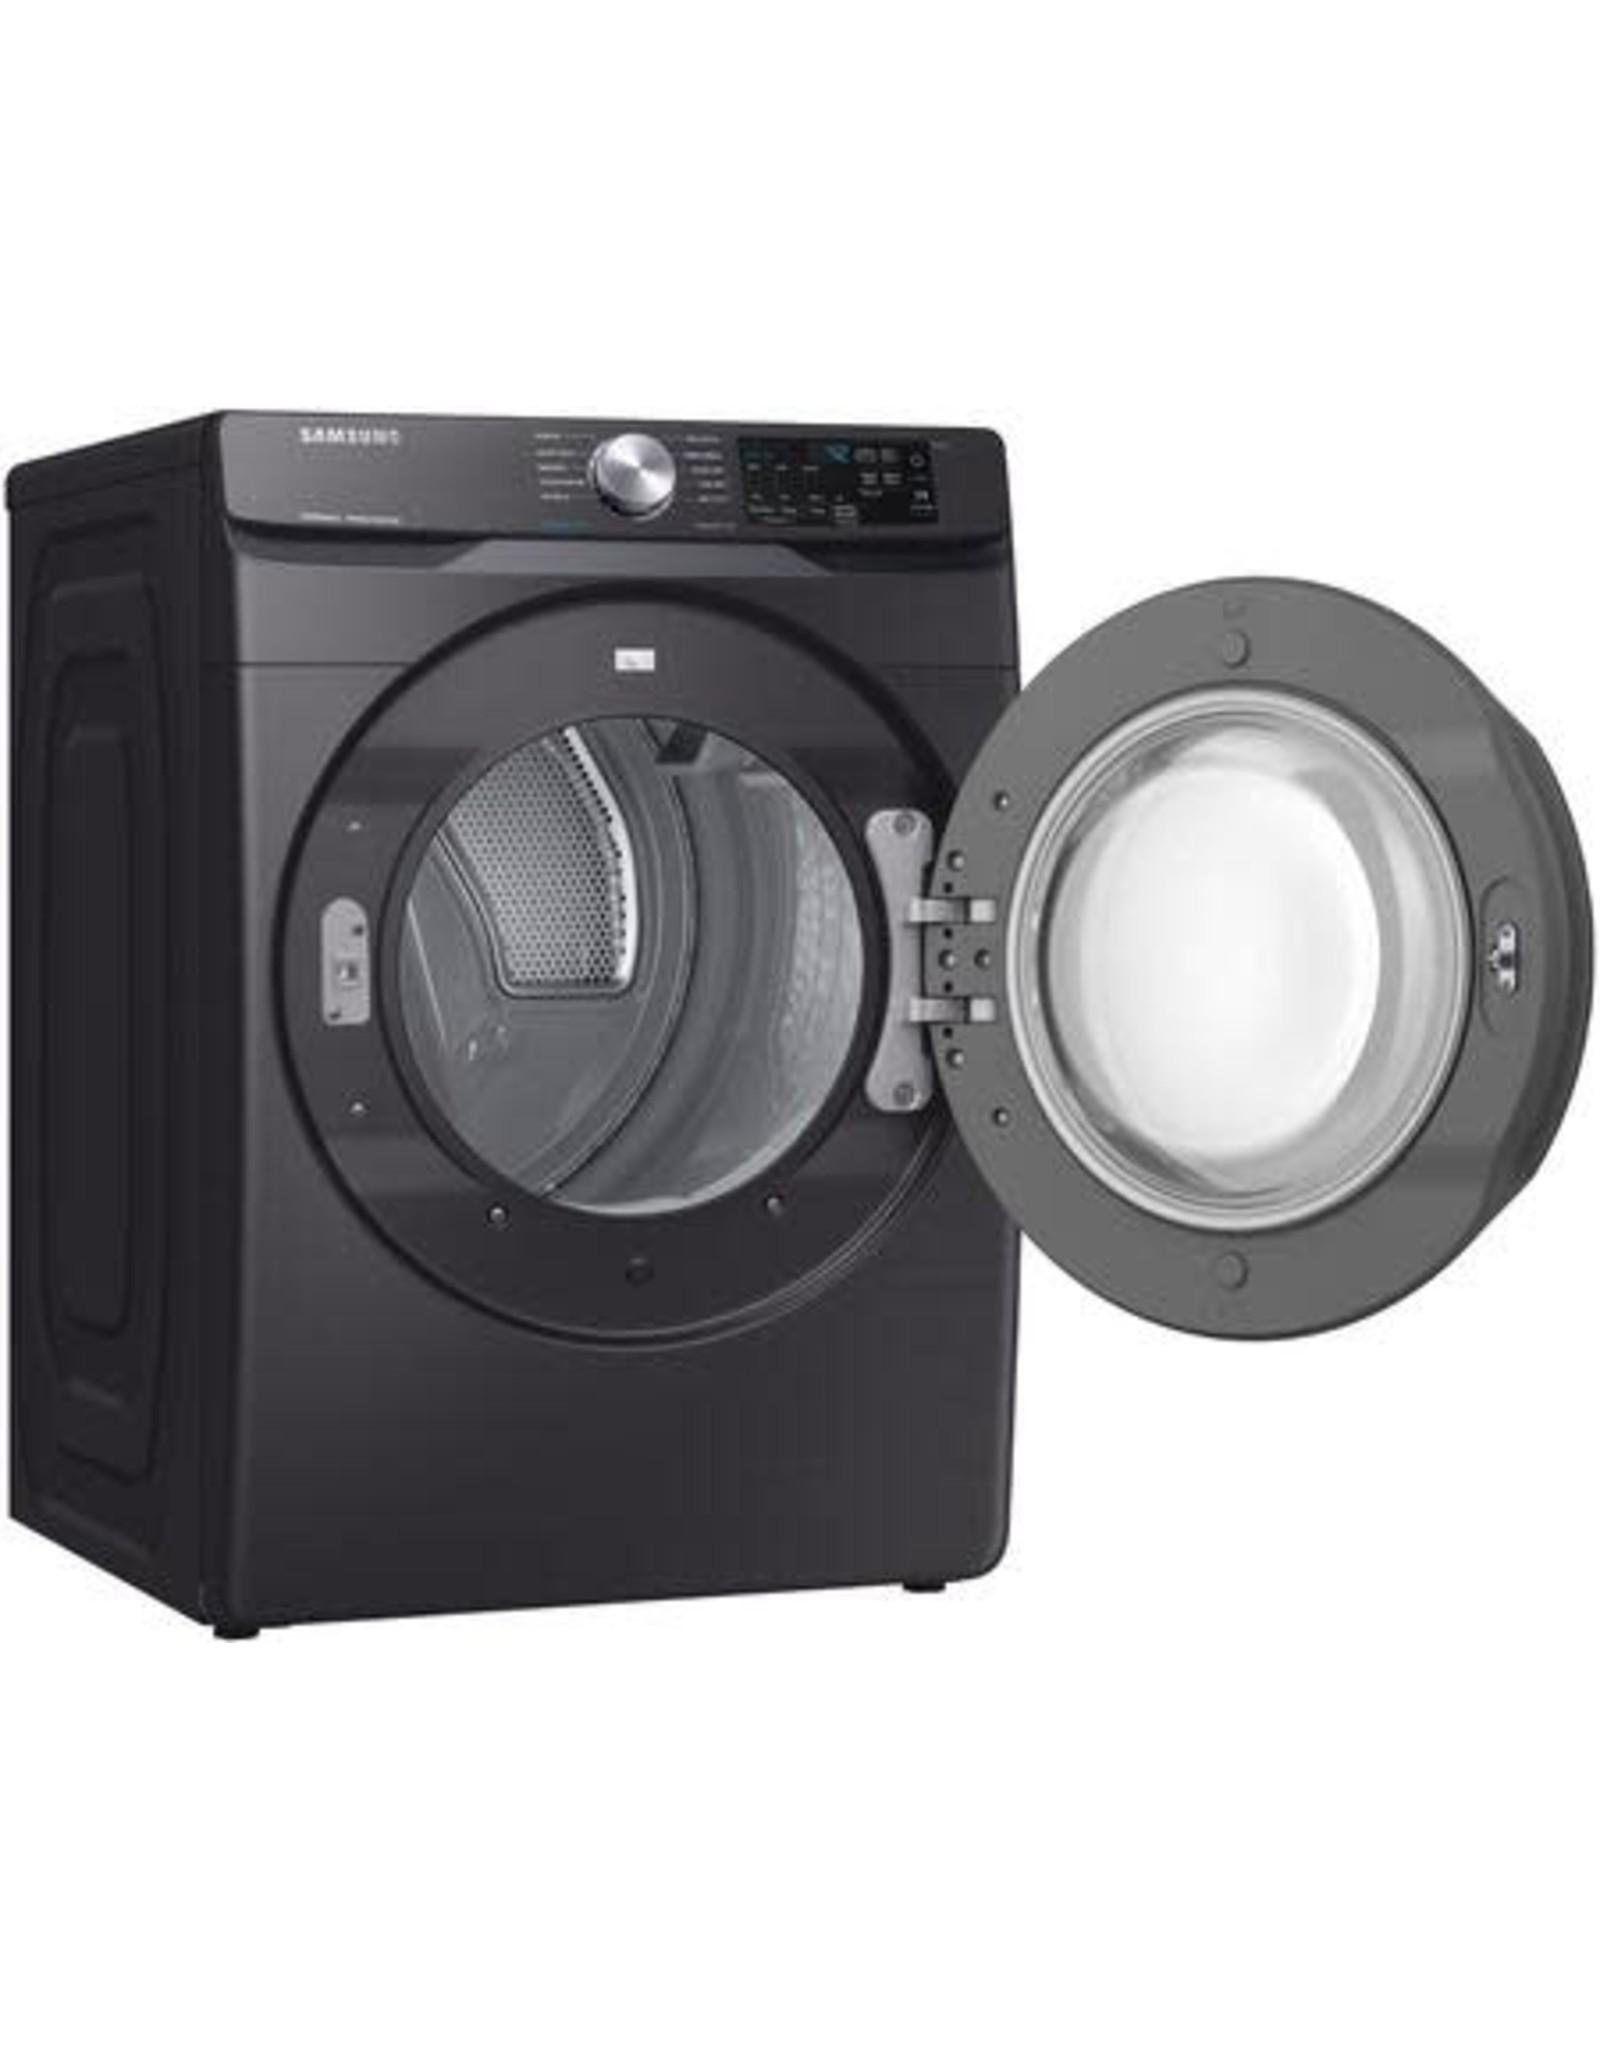 SAMSUNG Samsung 7.5 cu. ft. Black Stainless Gas Dryer with Steam